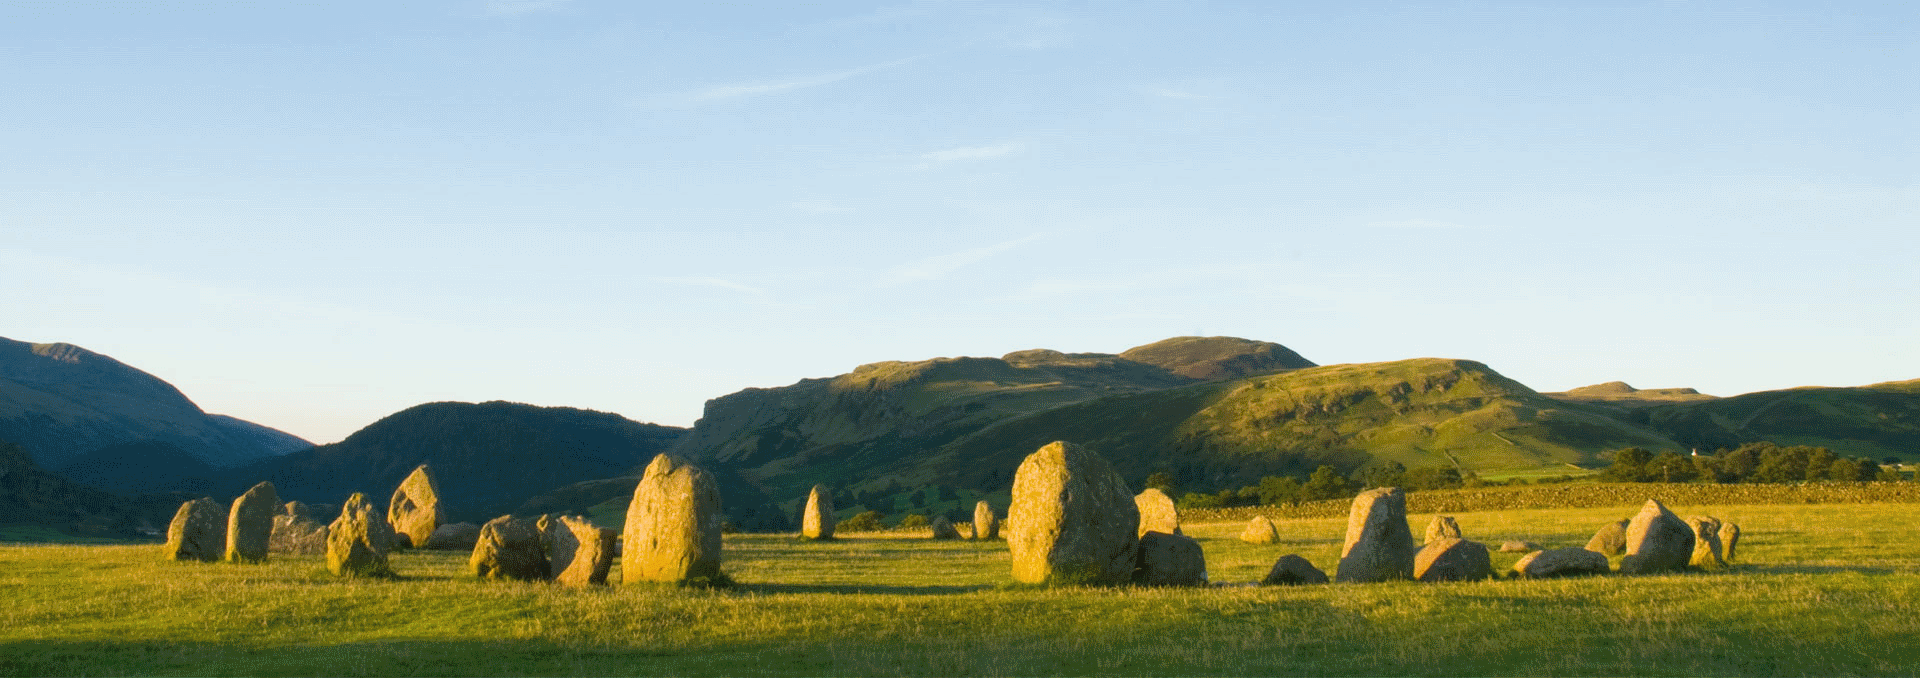 Castlerigg Stone Circle Allerdale Lake District